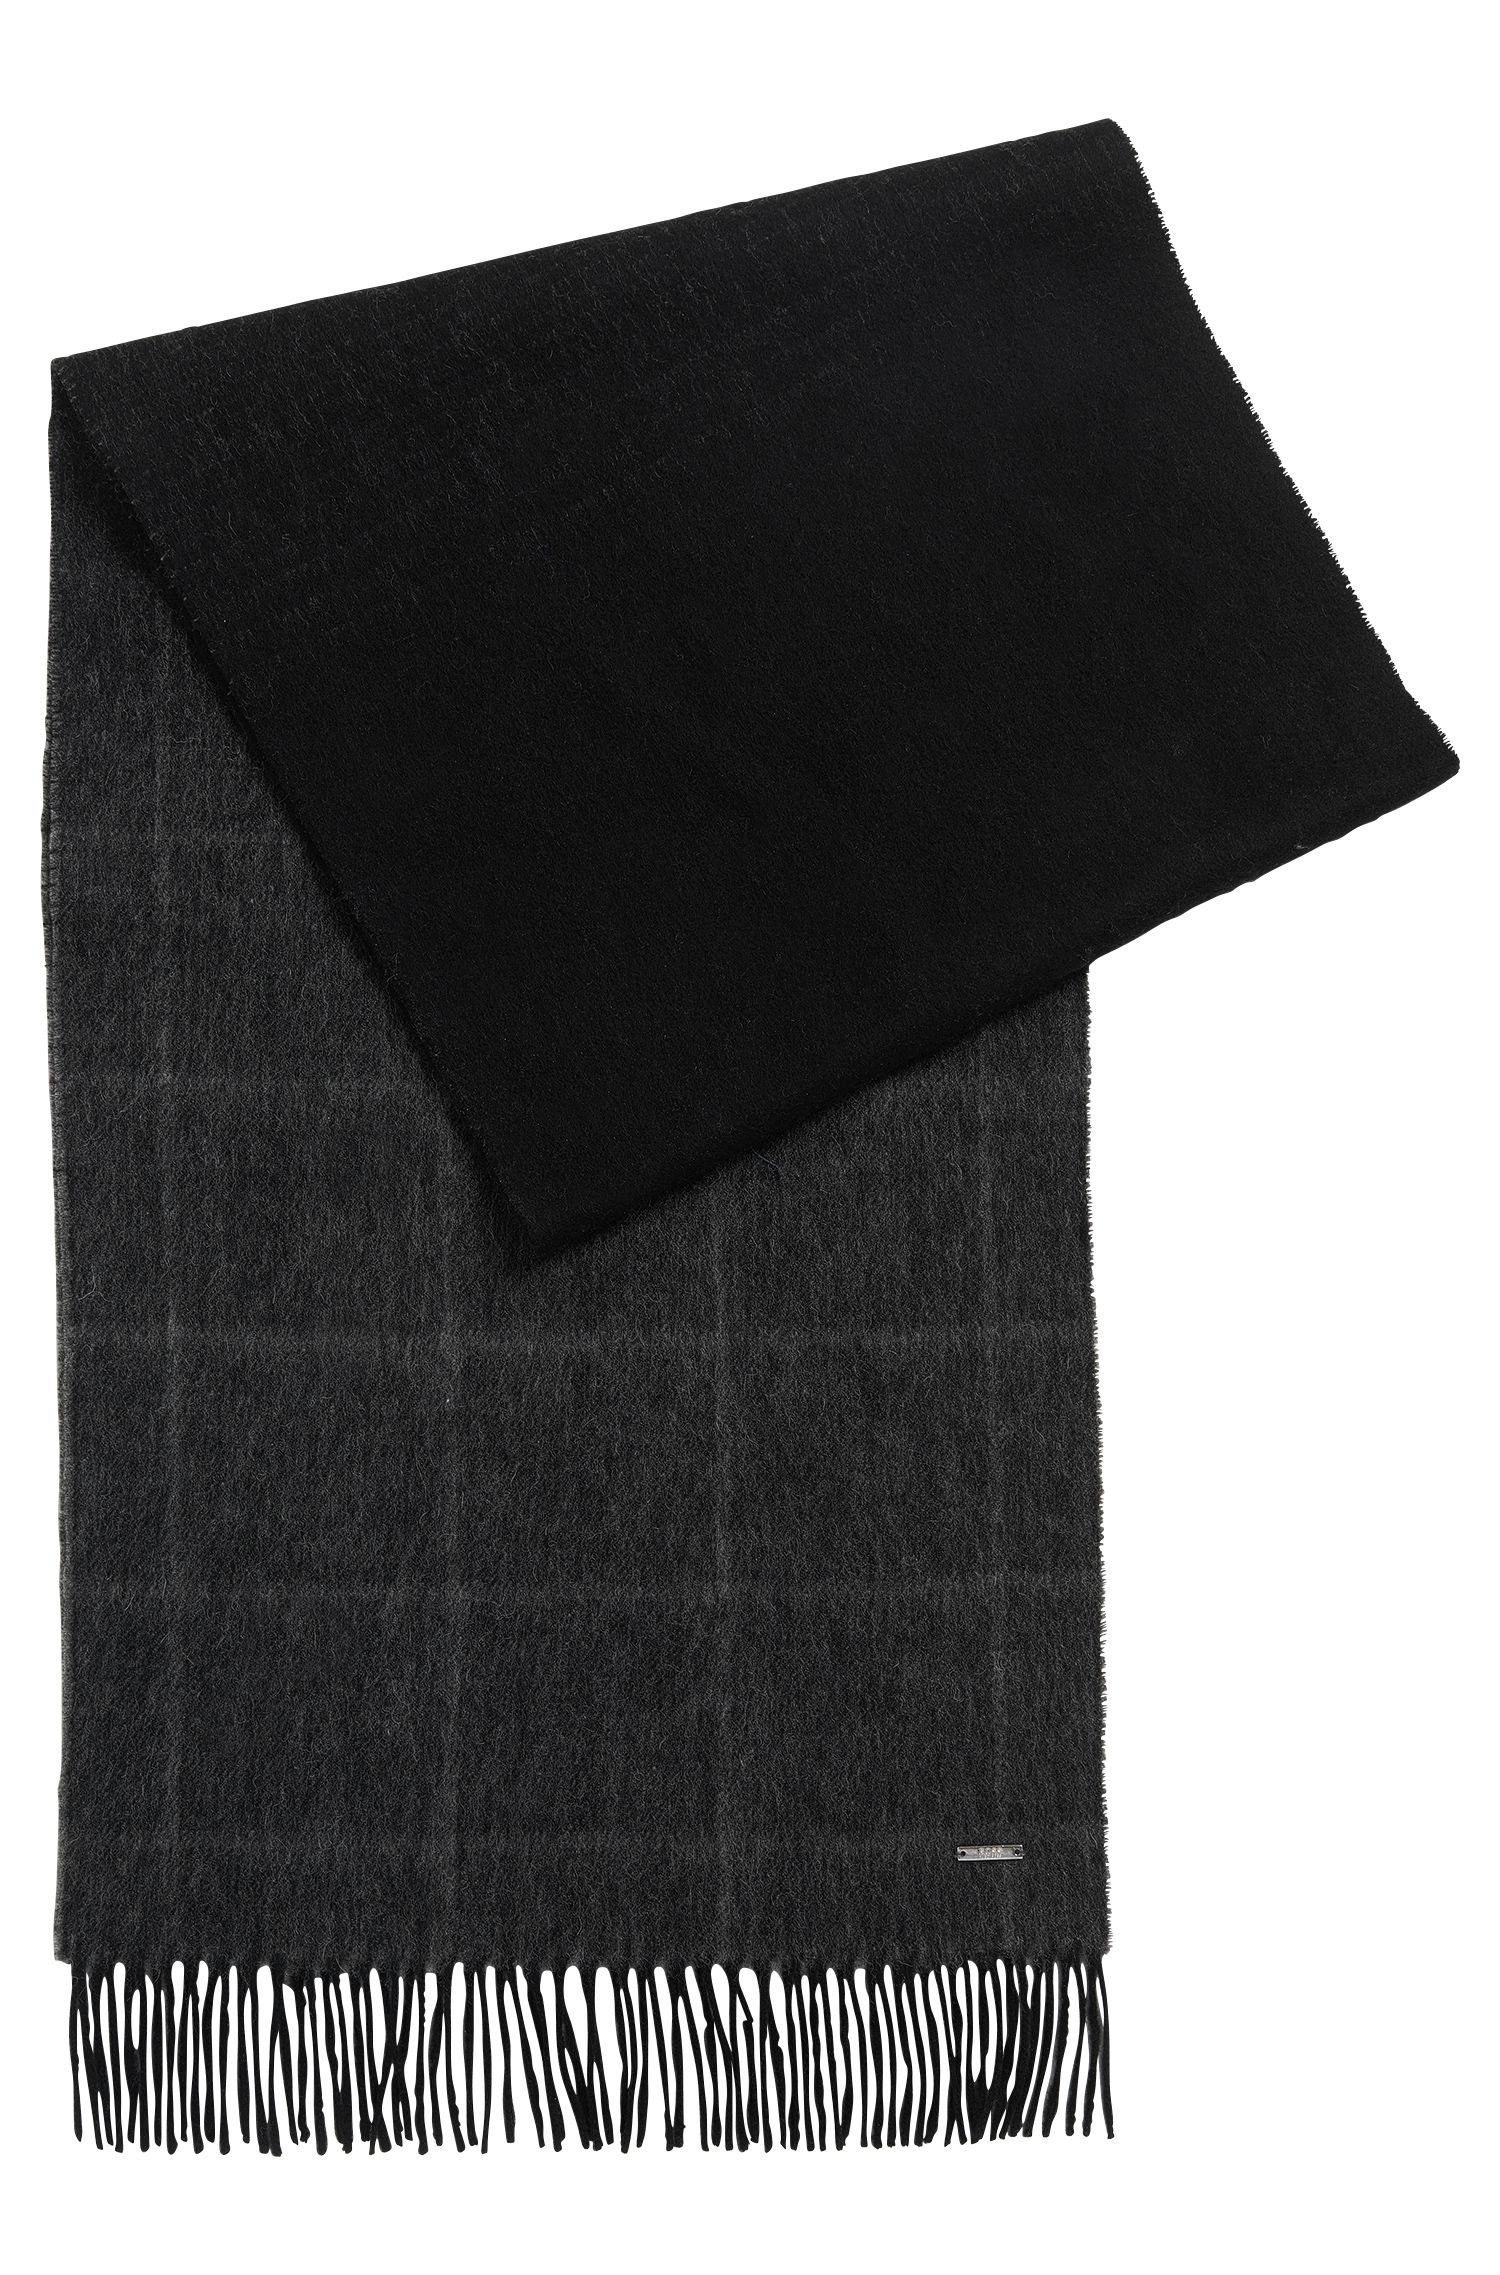 Windowpane Virgin Wool-Cashmere Scarf | Hereno